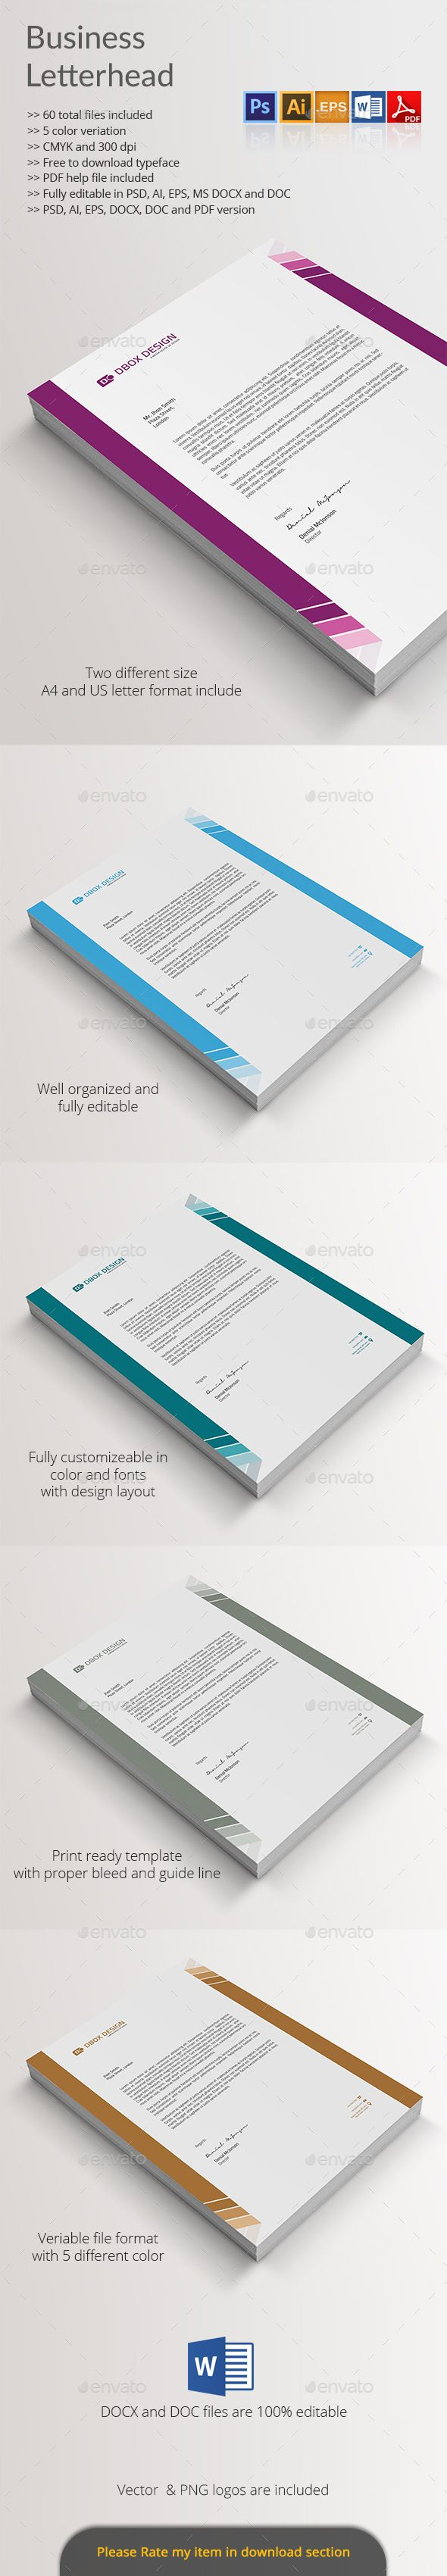 Business Letterhead Dimensions Letterhead 15 Free Vector